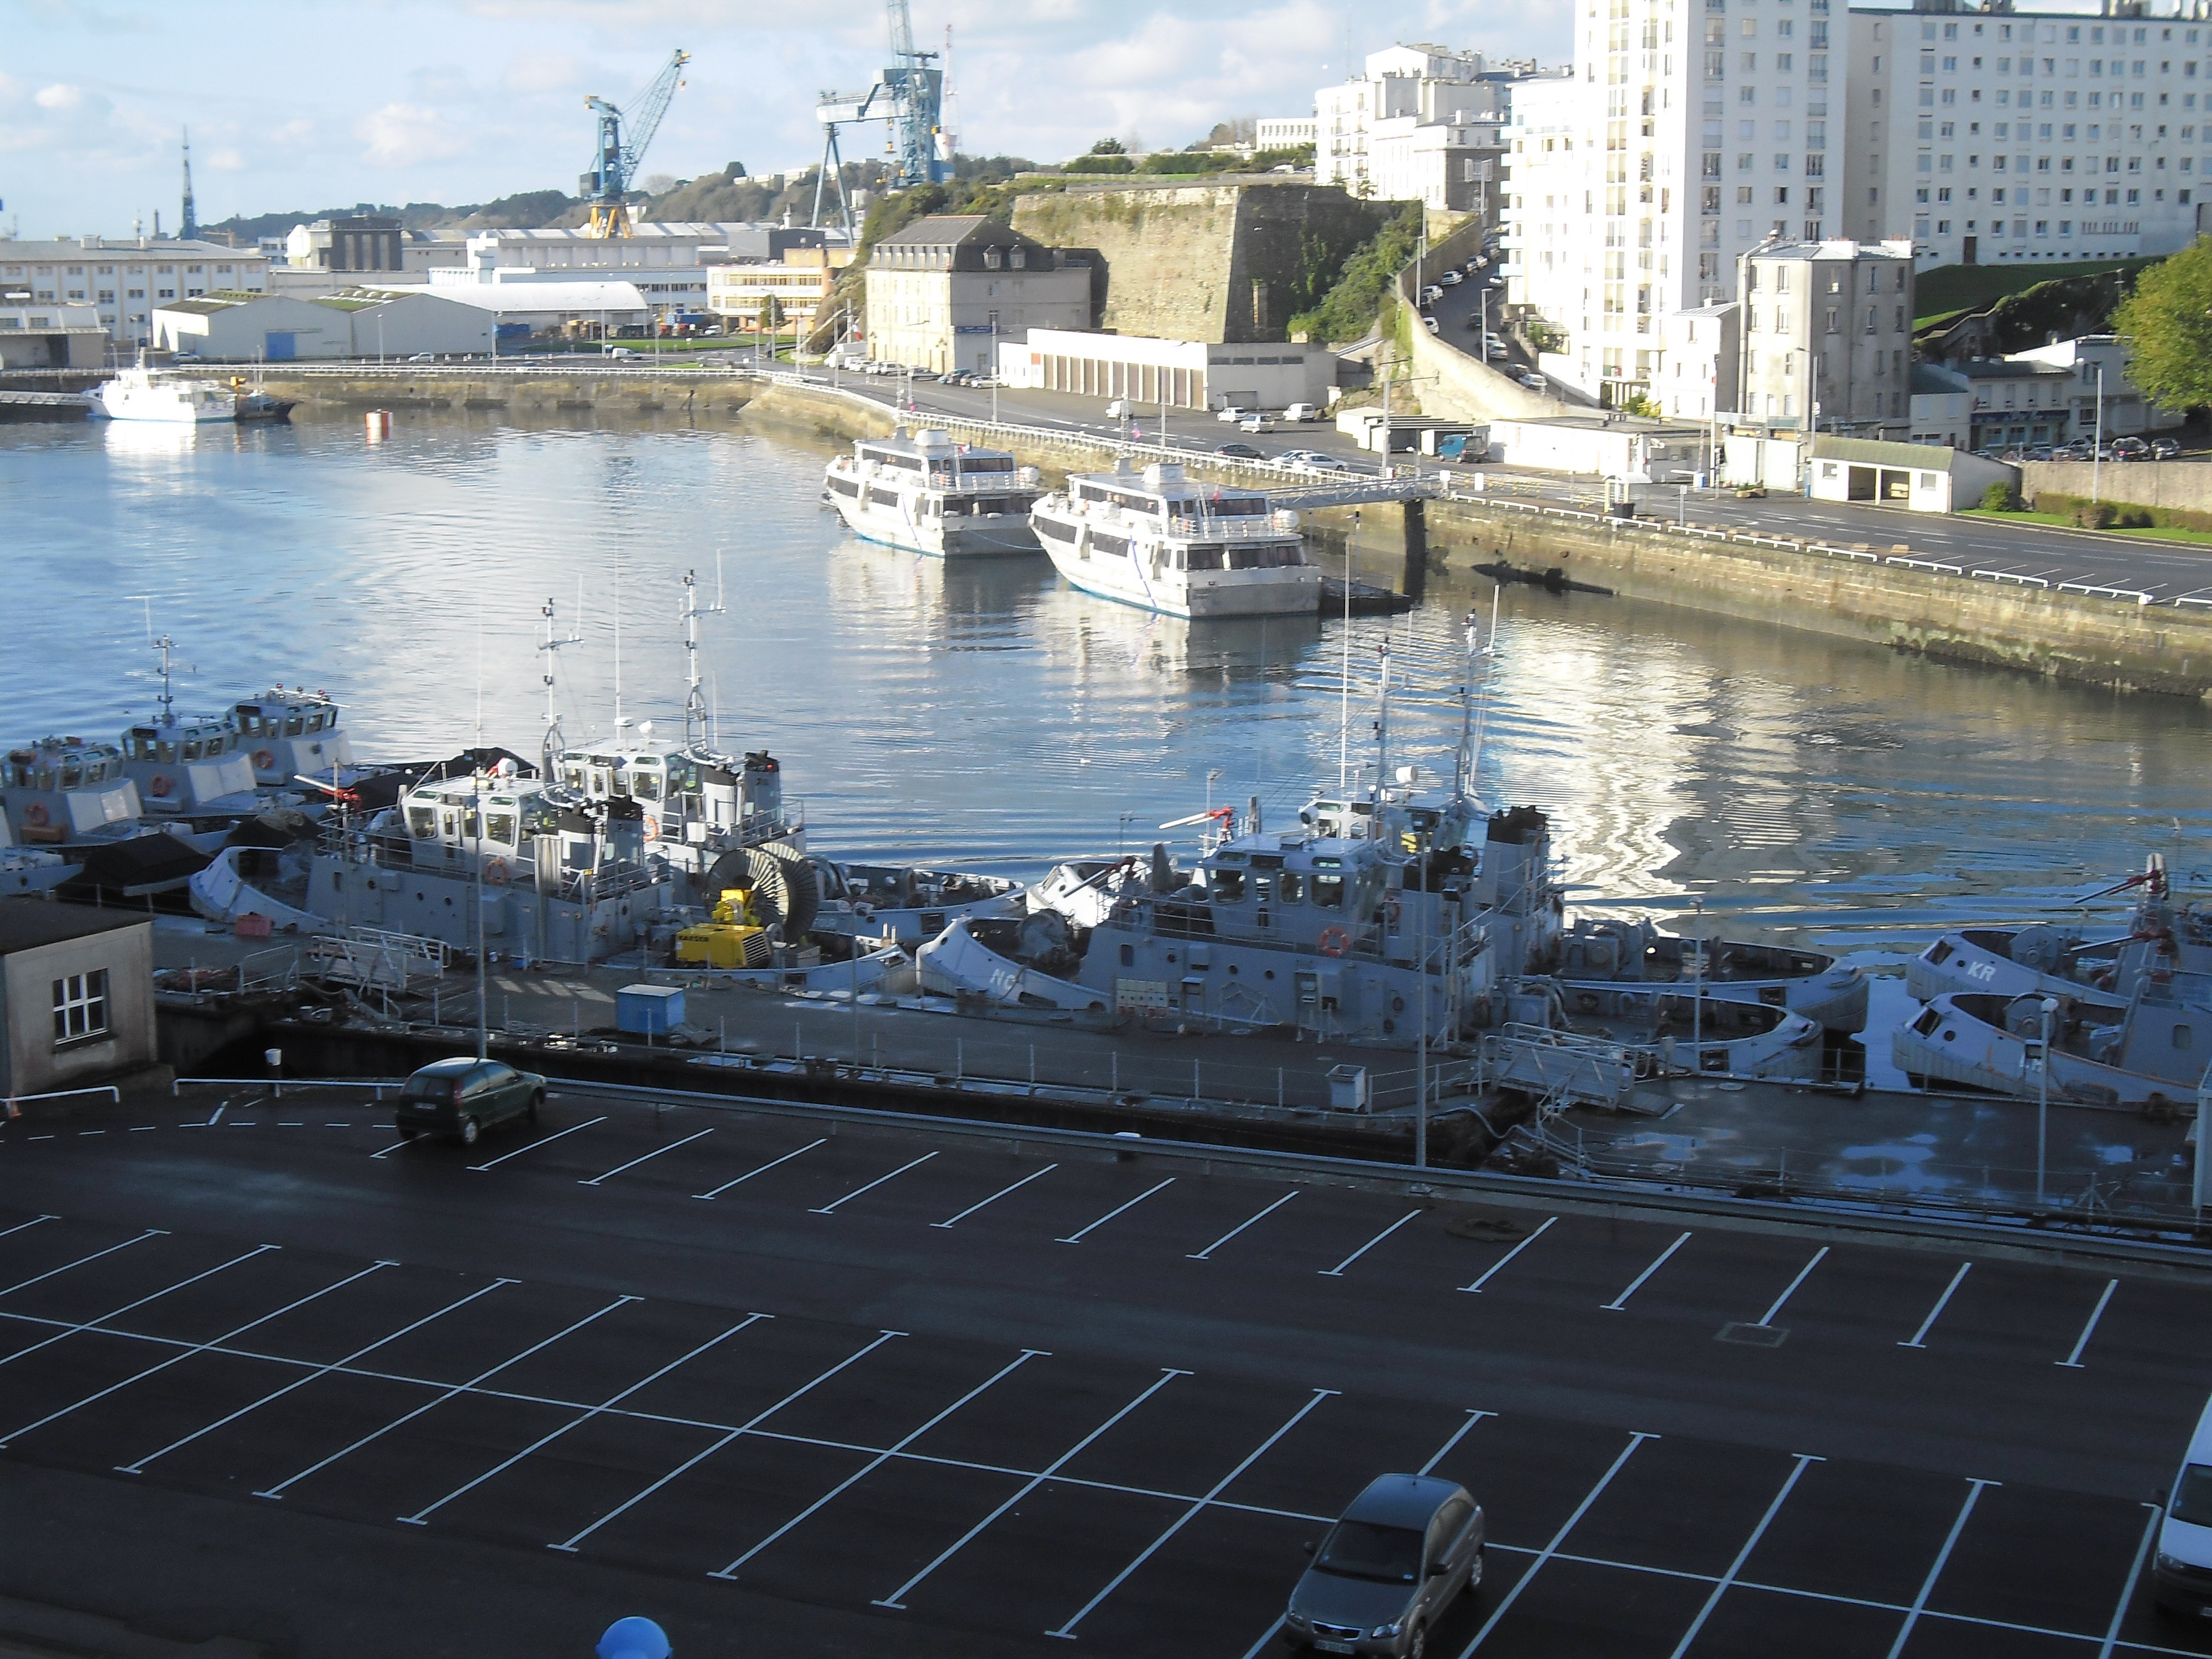 brest-base-navale-port-nov12